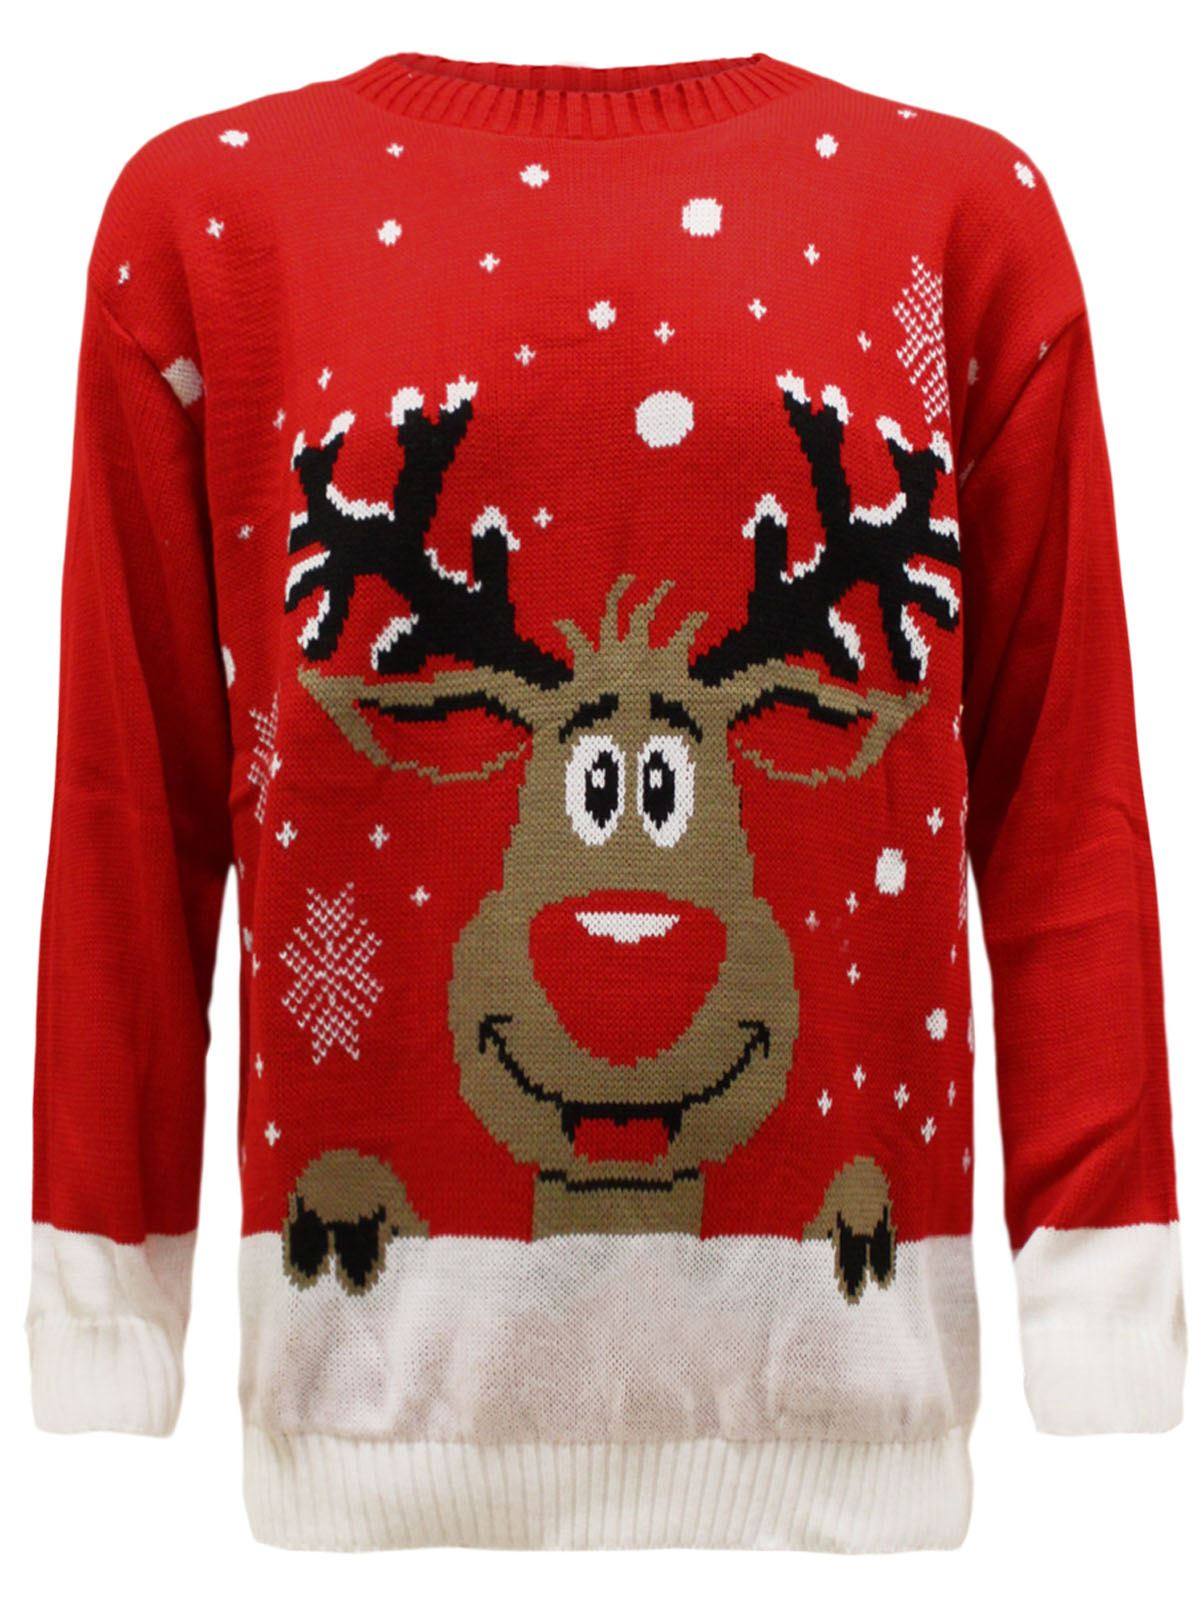 Knit christmas sweater